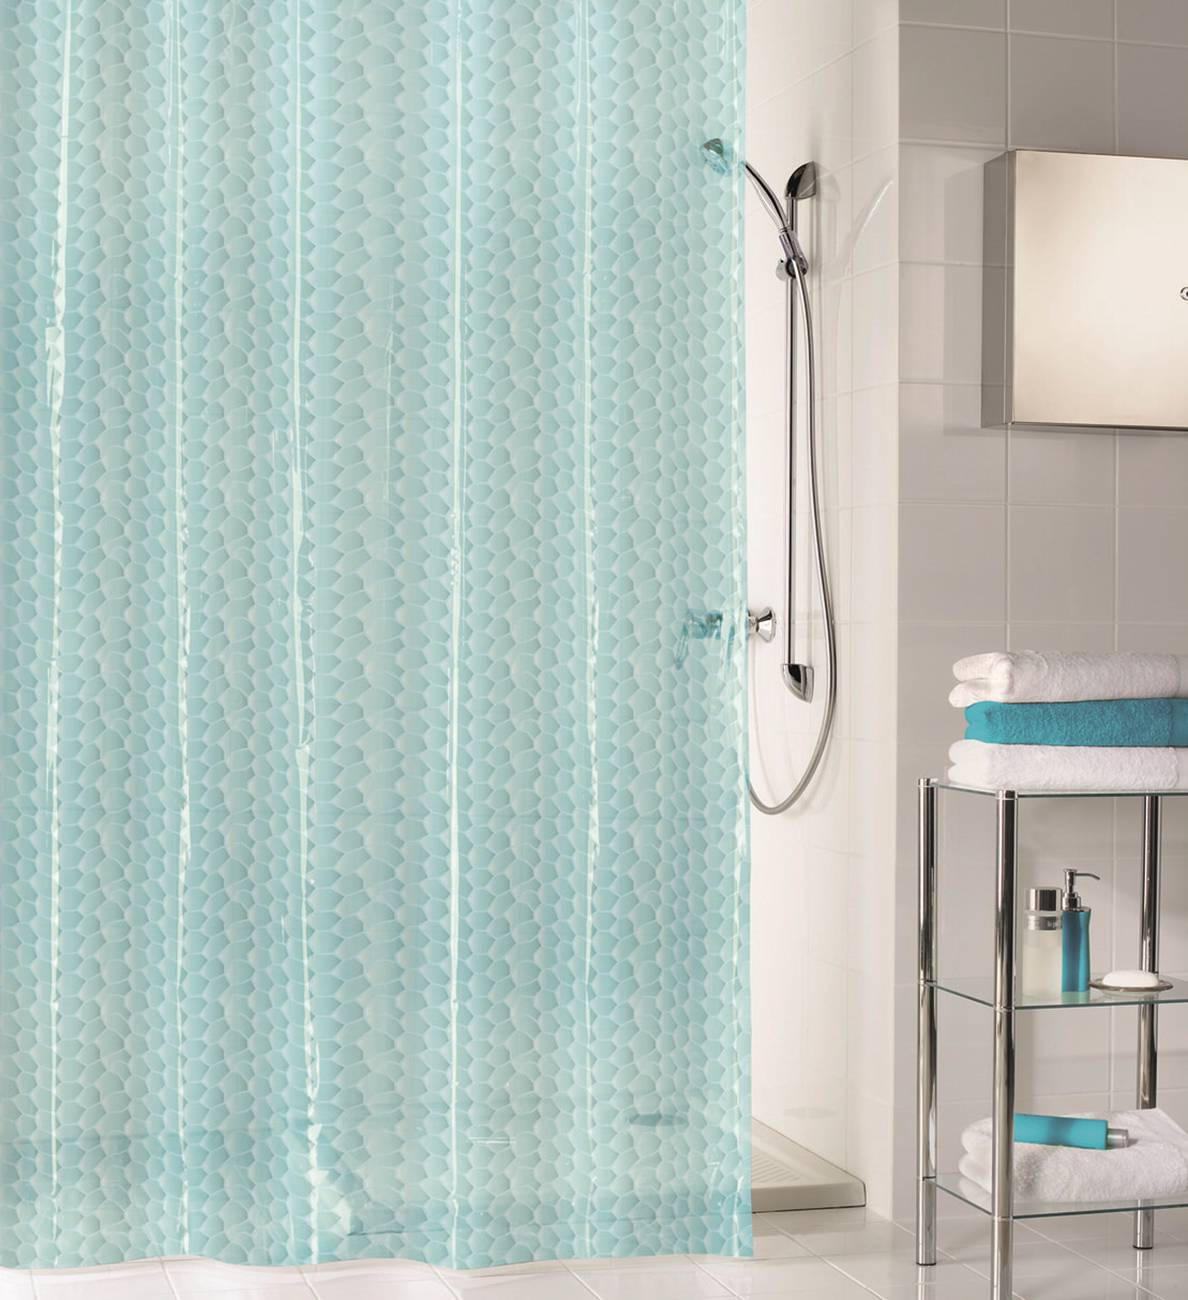 Duschvorhang Soapy PEVA Wasserblau 180x200 cm